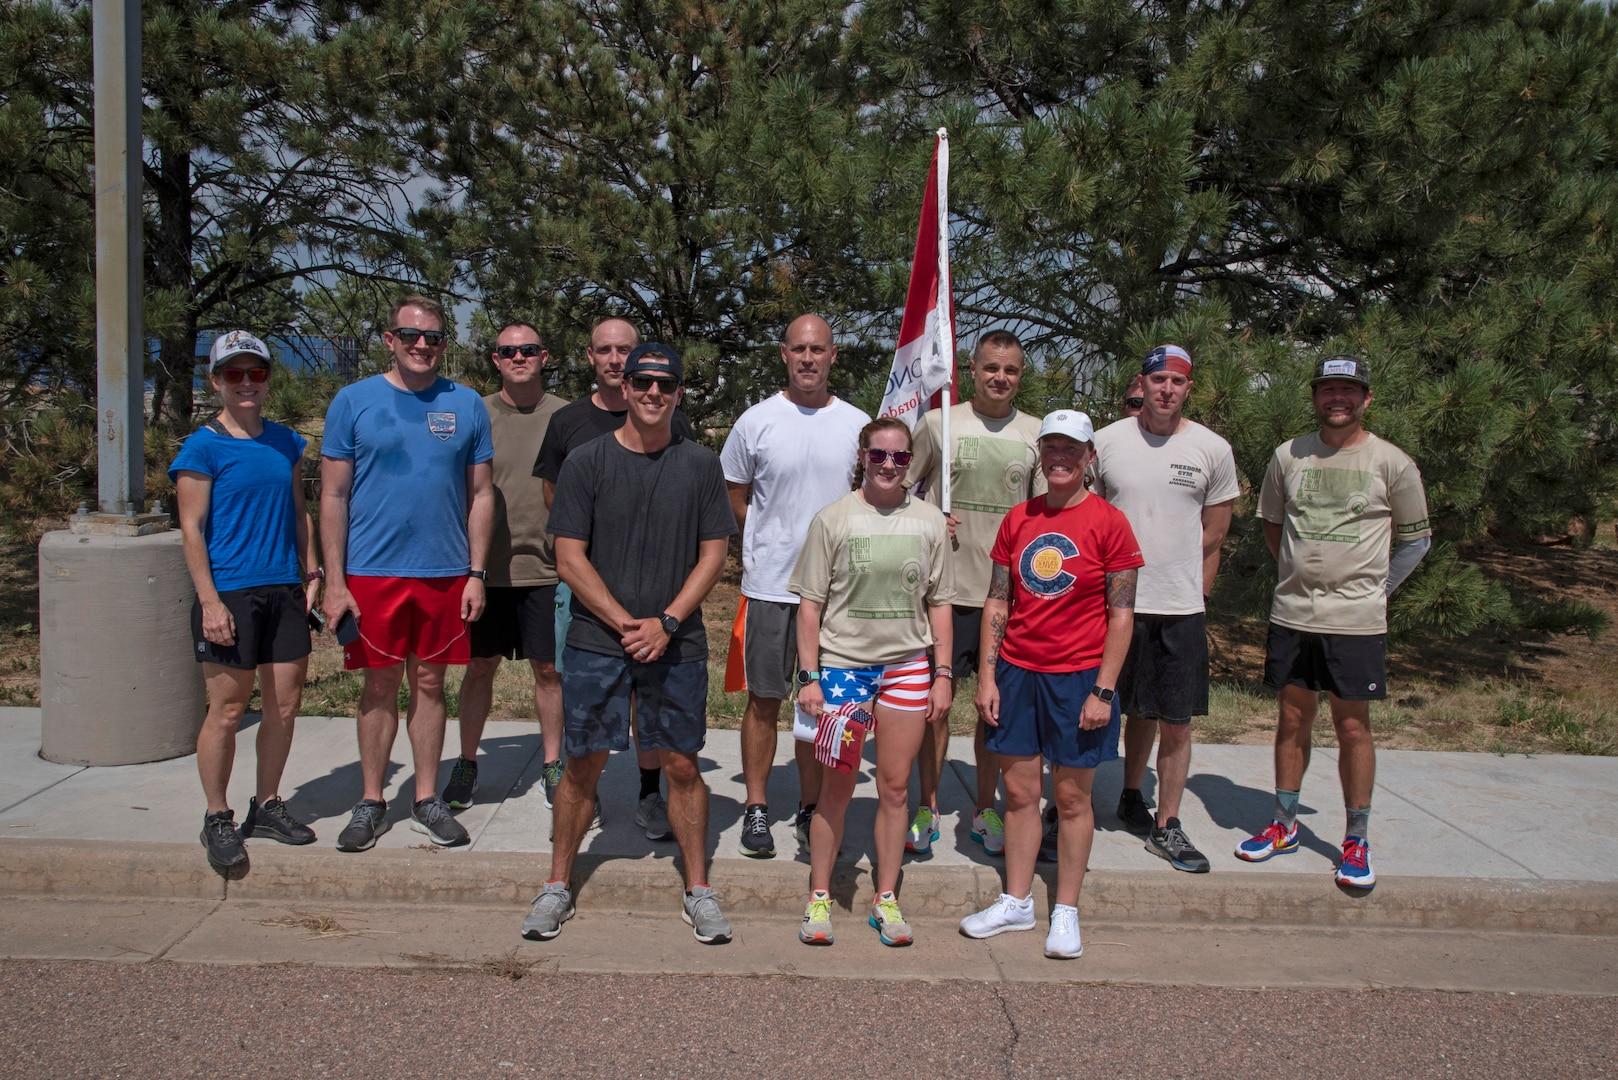 Runners pose for photo following fallen service member run